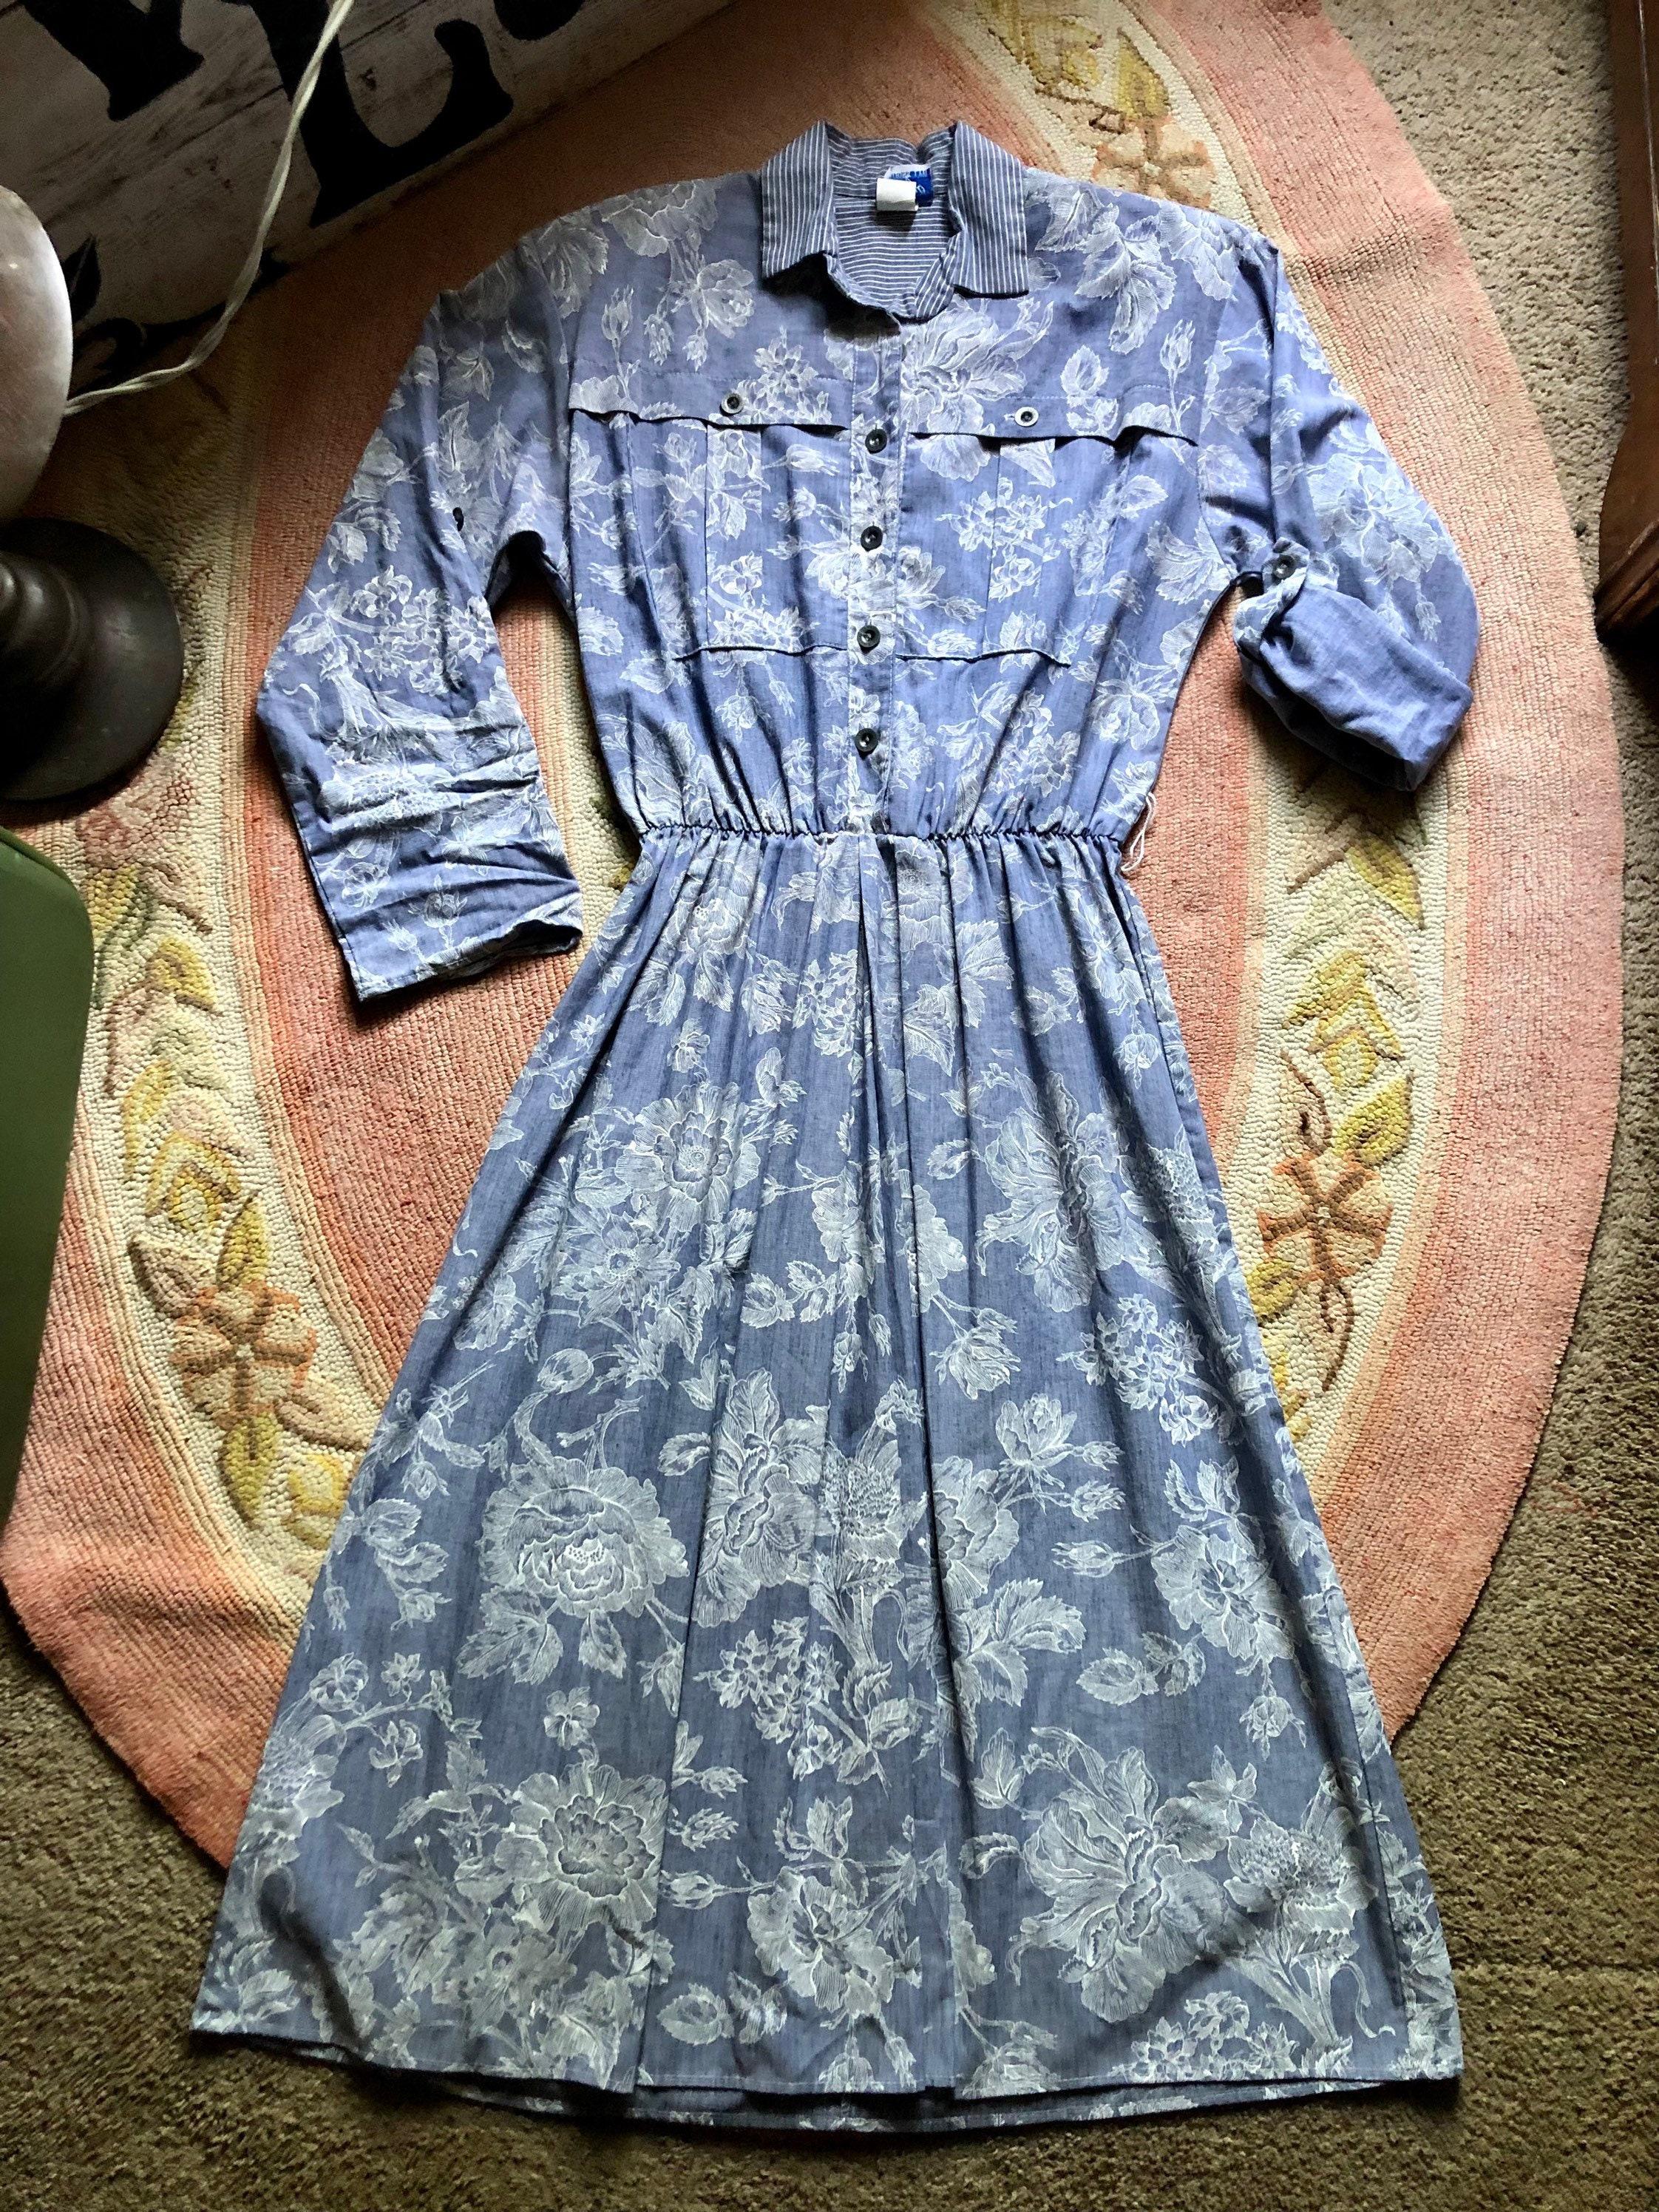 80s Dresses | Casual to Party Dresses Adorable 1980s Vintage Floral Dress Womens Size MediumLarge $50.40 AT vintagedancer.com